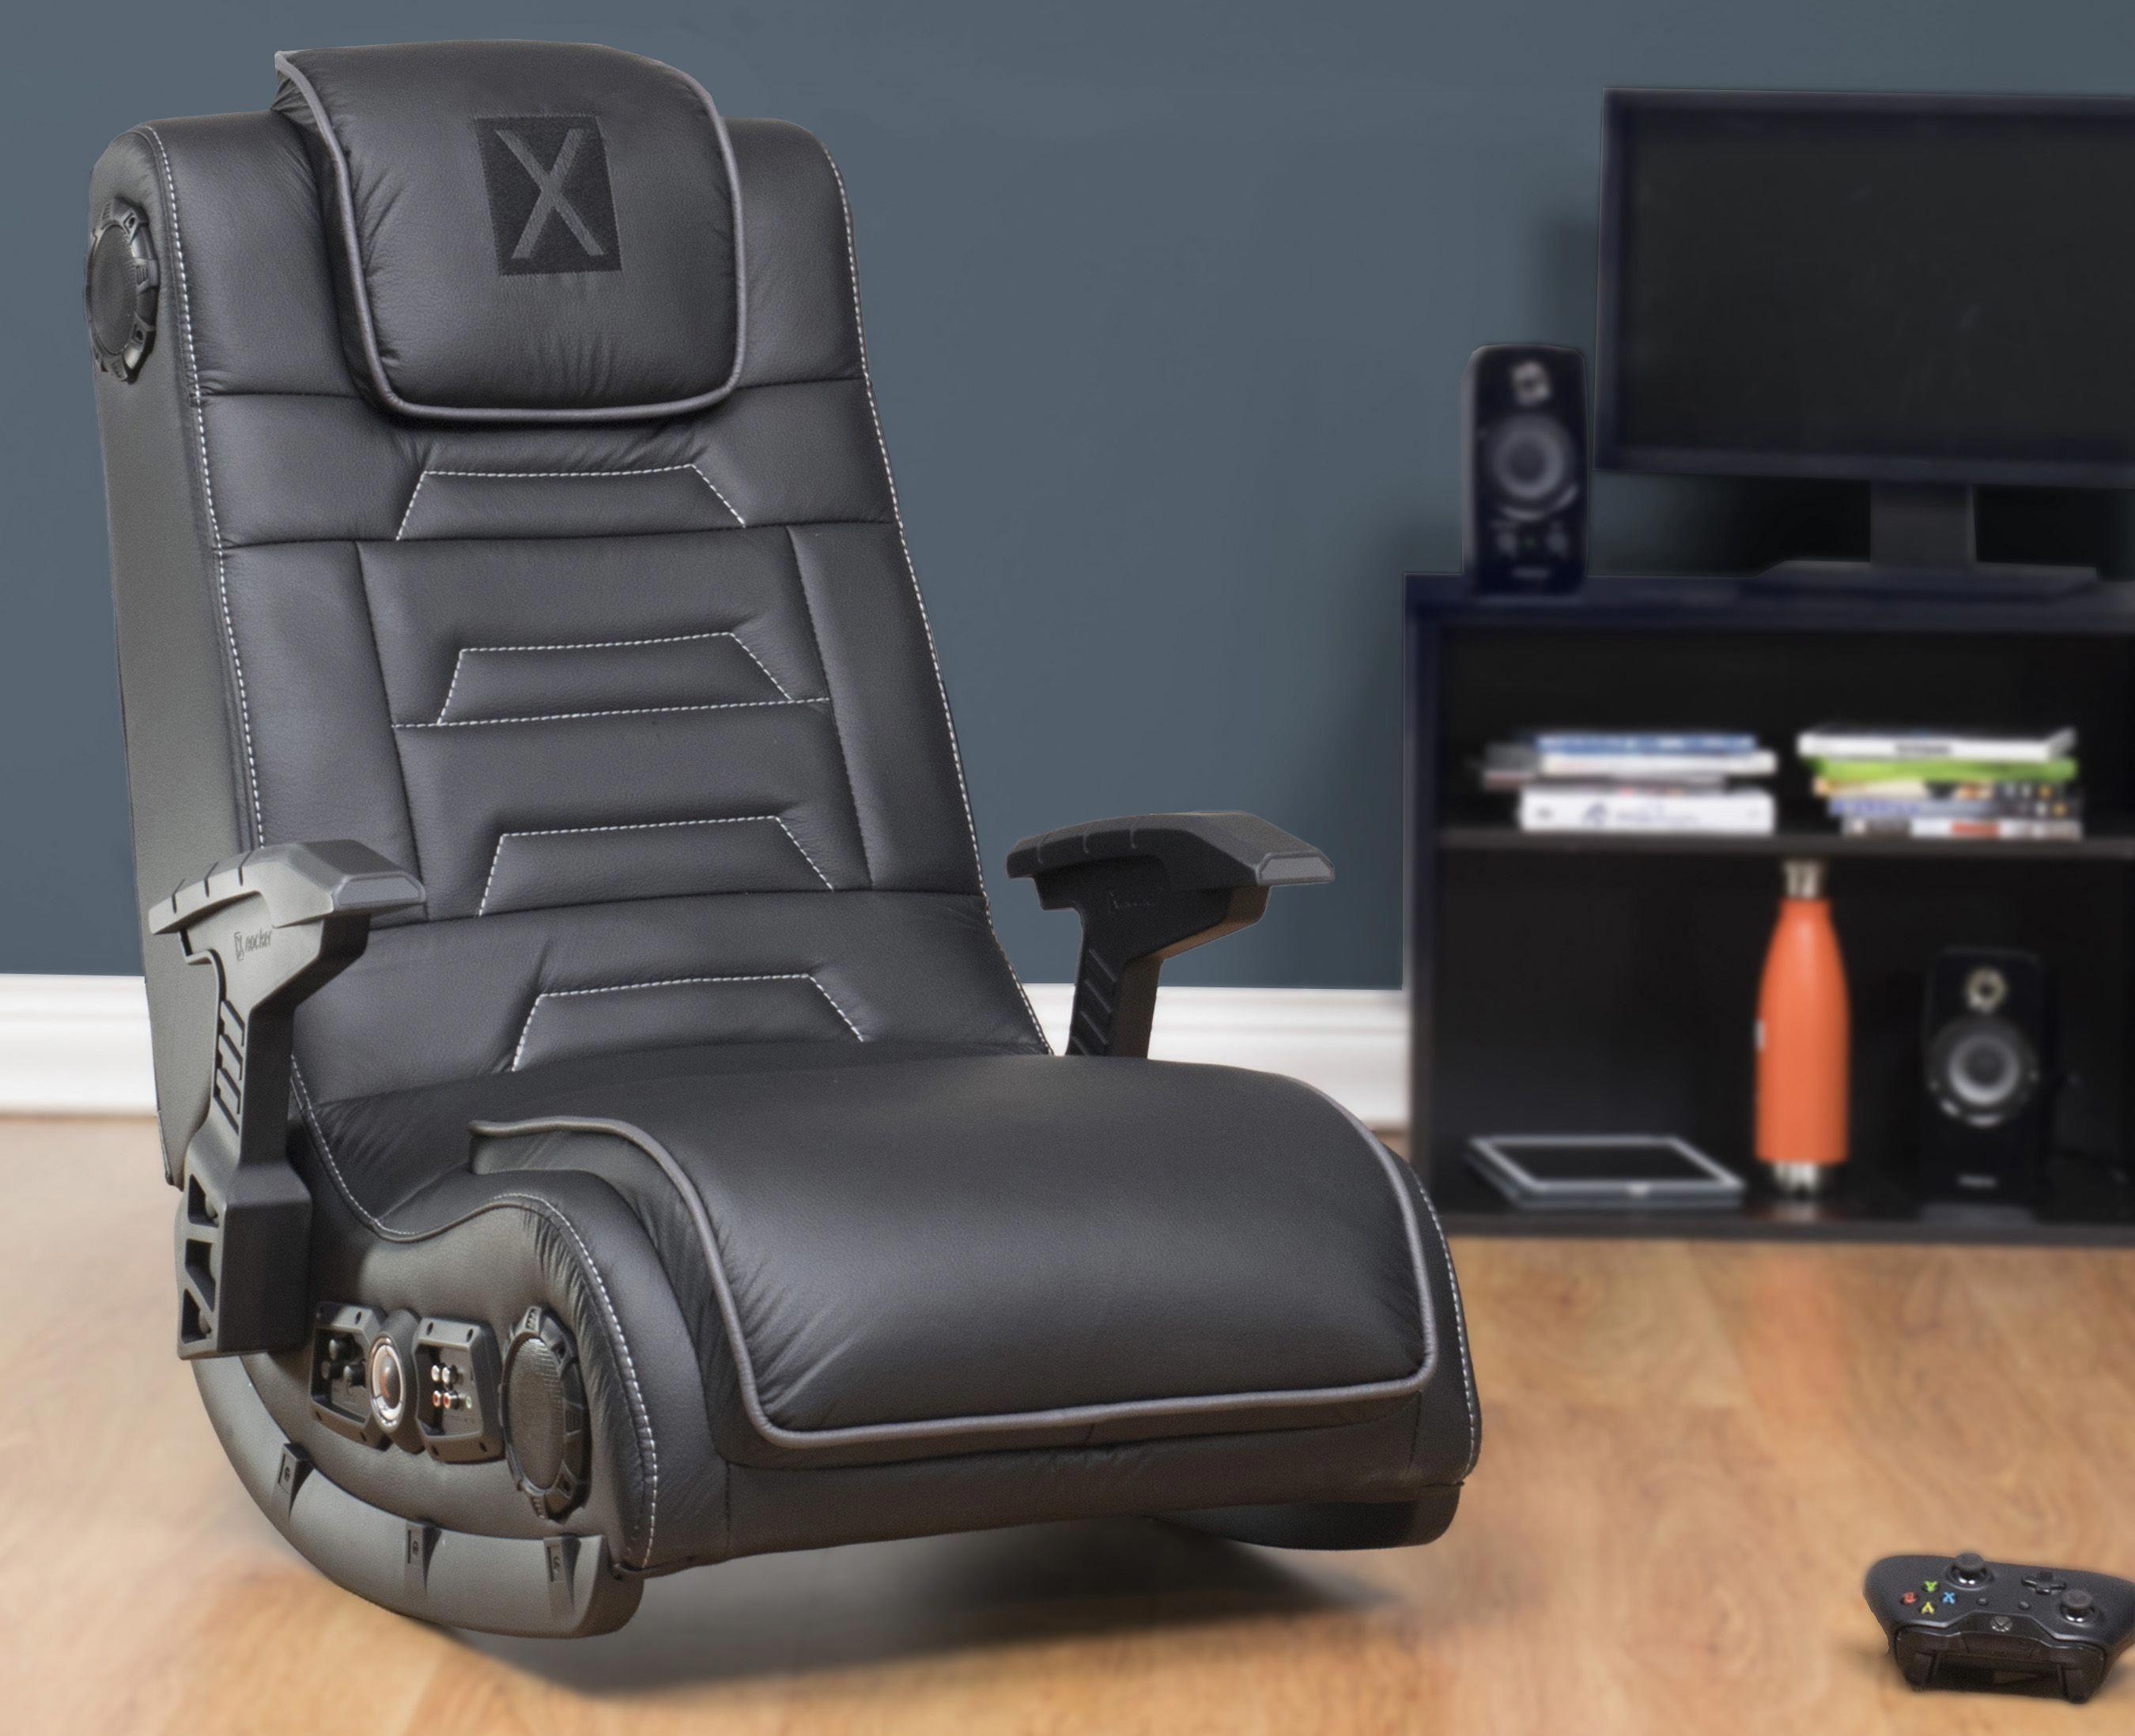 X Rocker Pro Series H3 4 1 Wireless Audio Gaming Chair Black